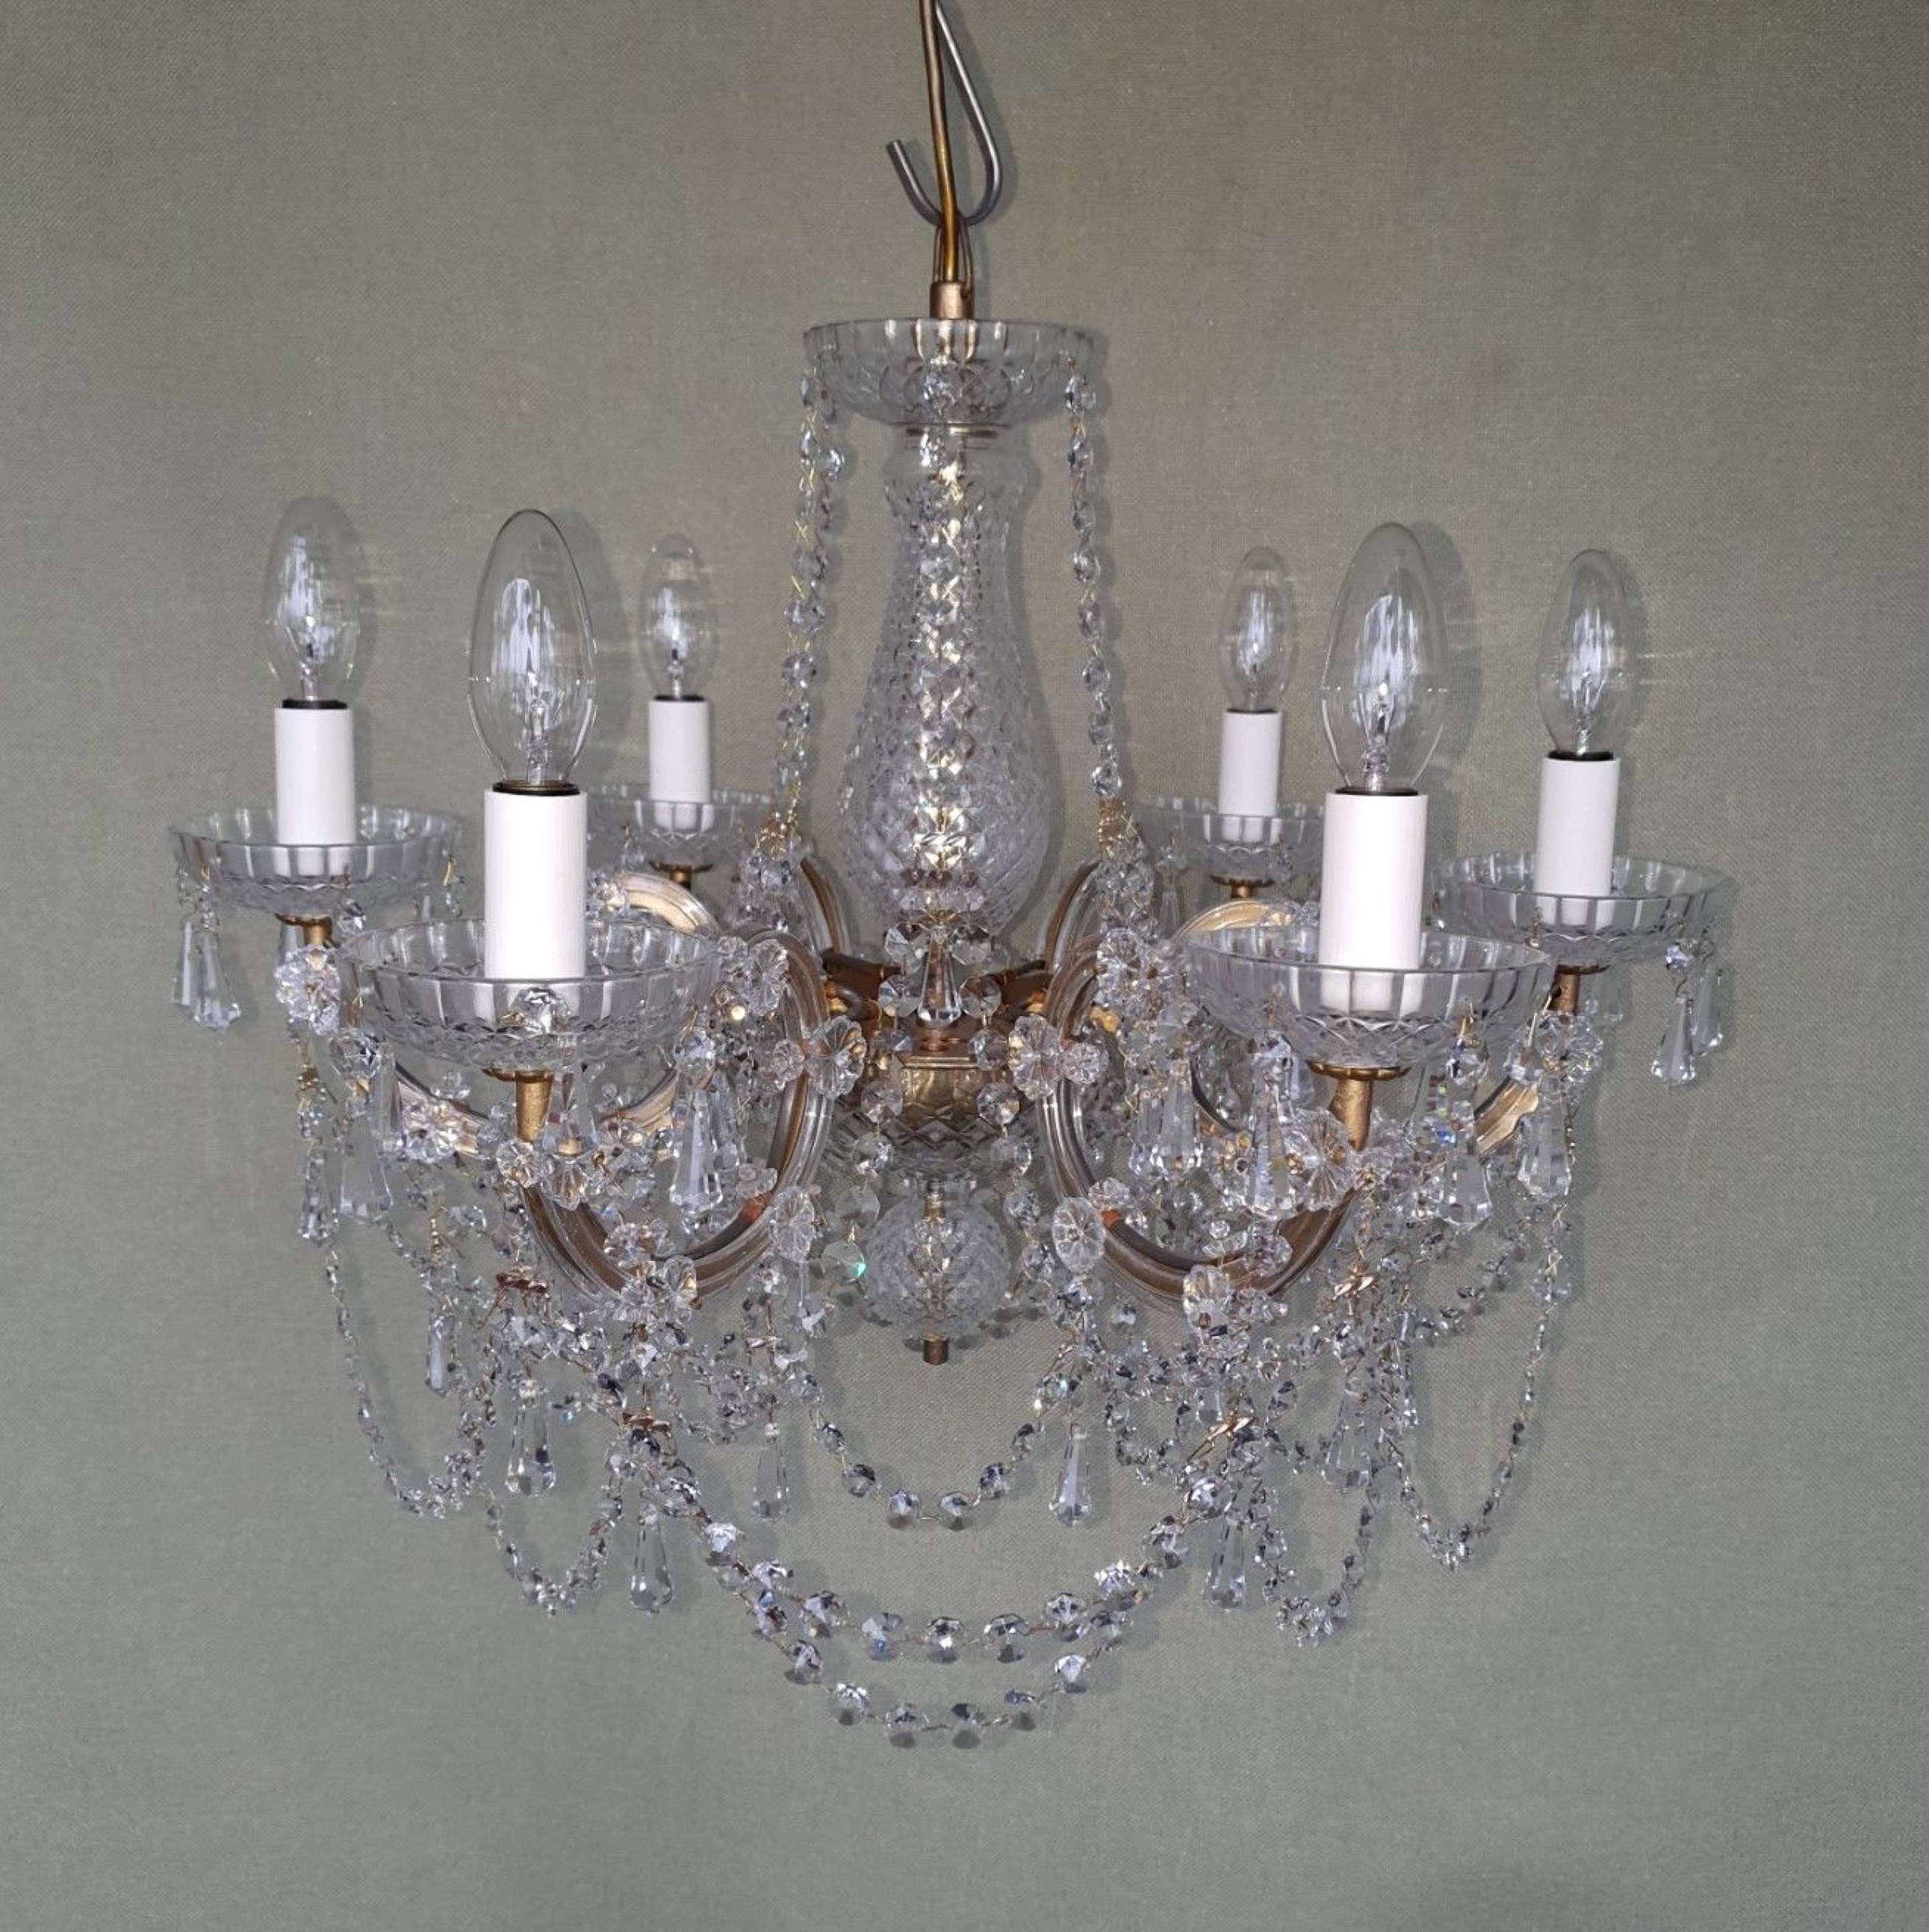 6 Light Maria Theresa Chandelier